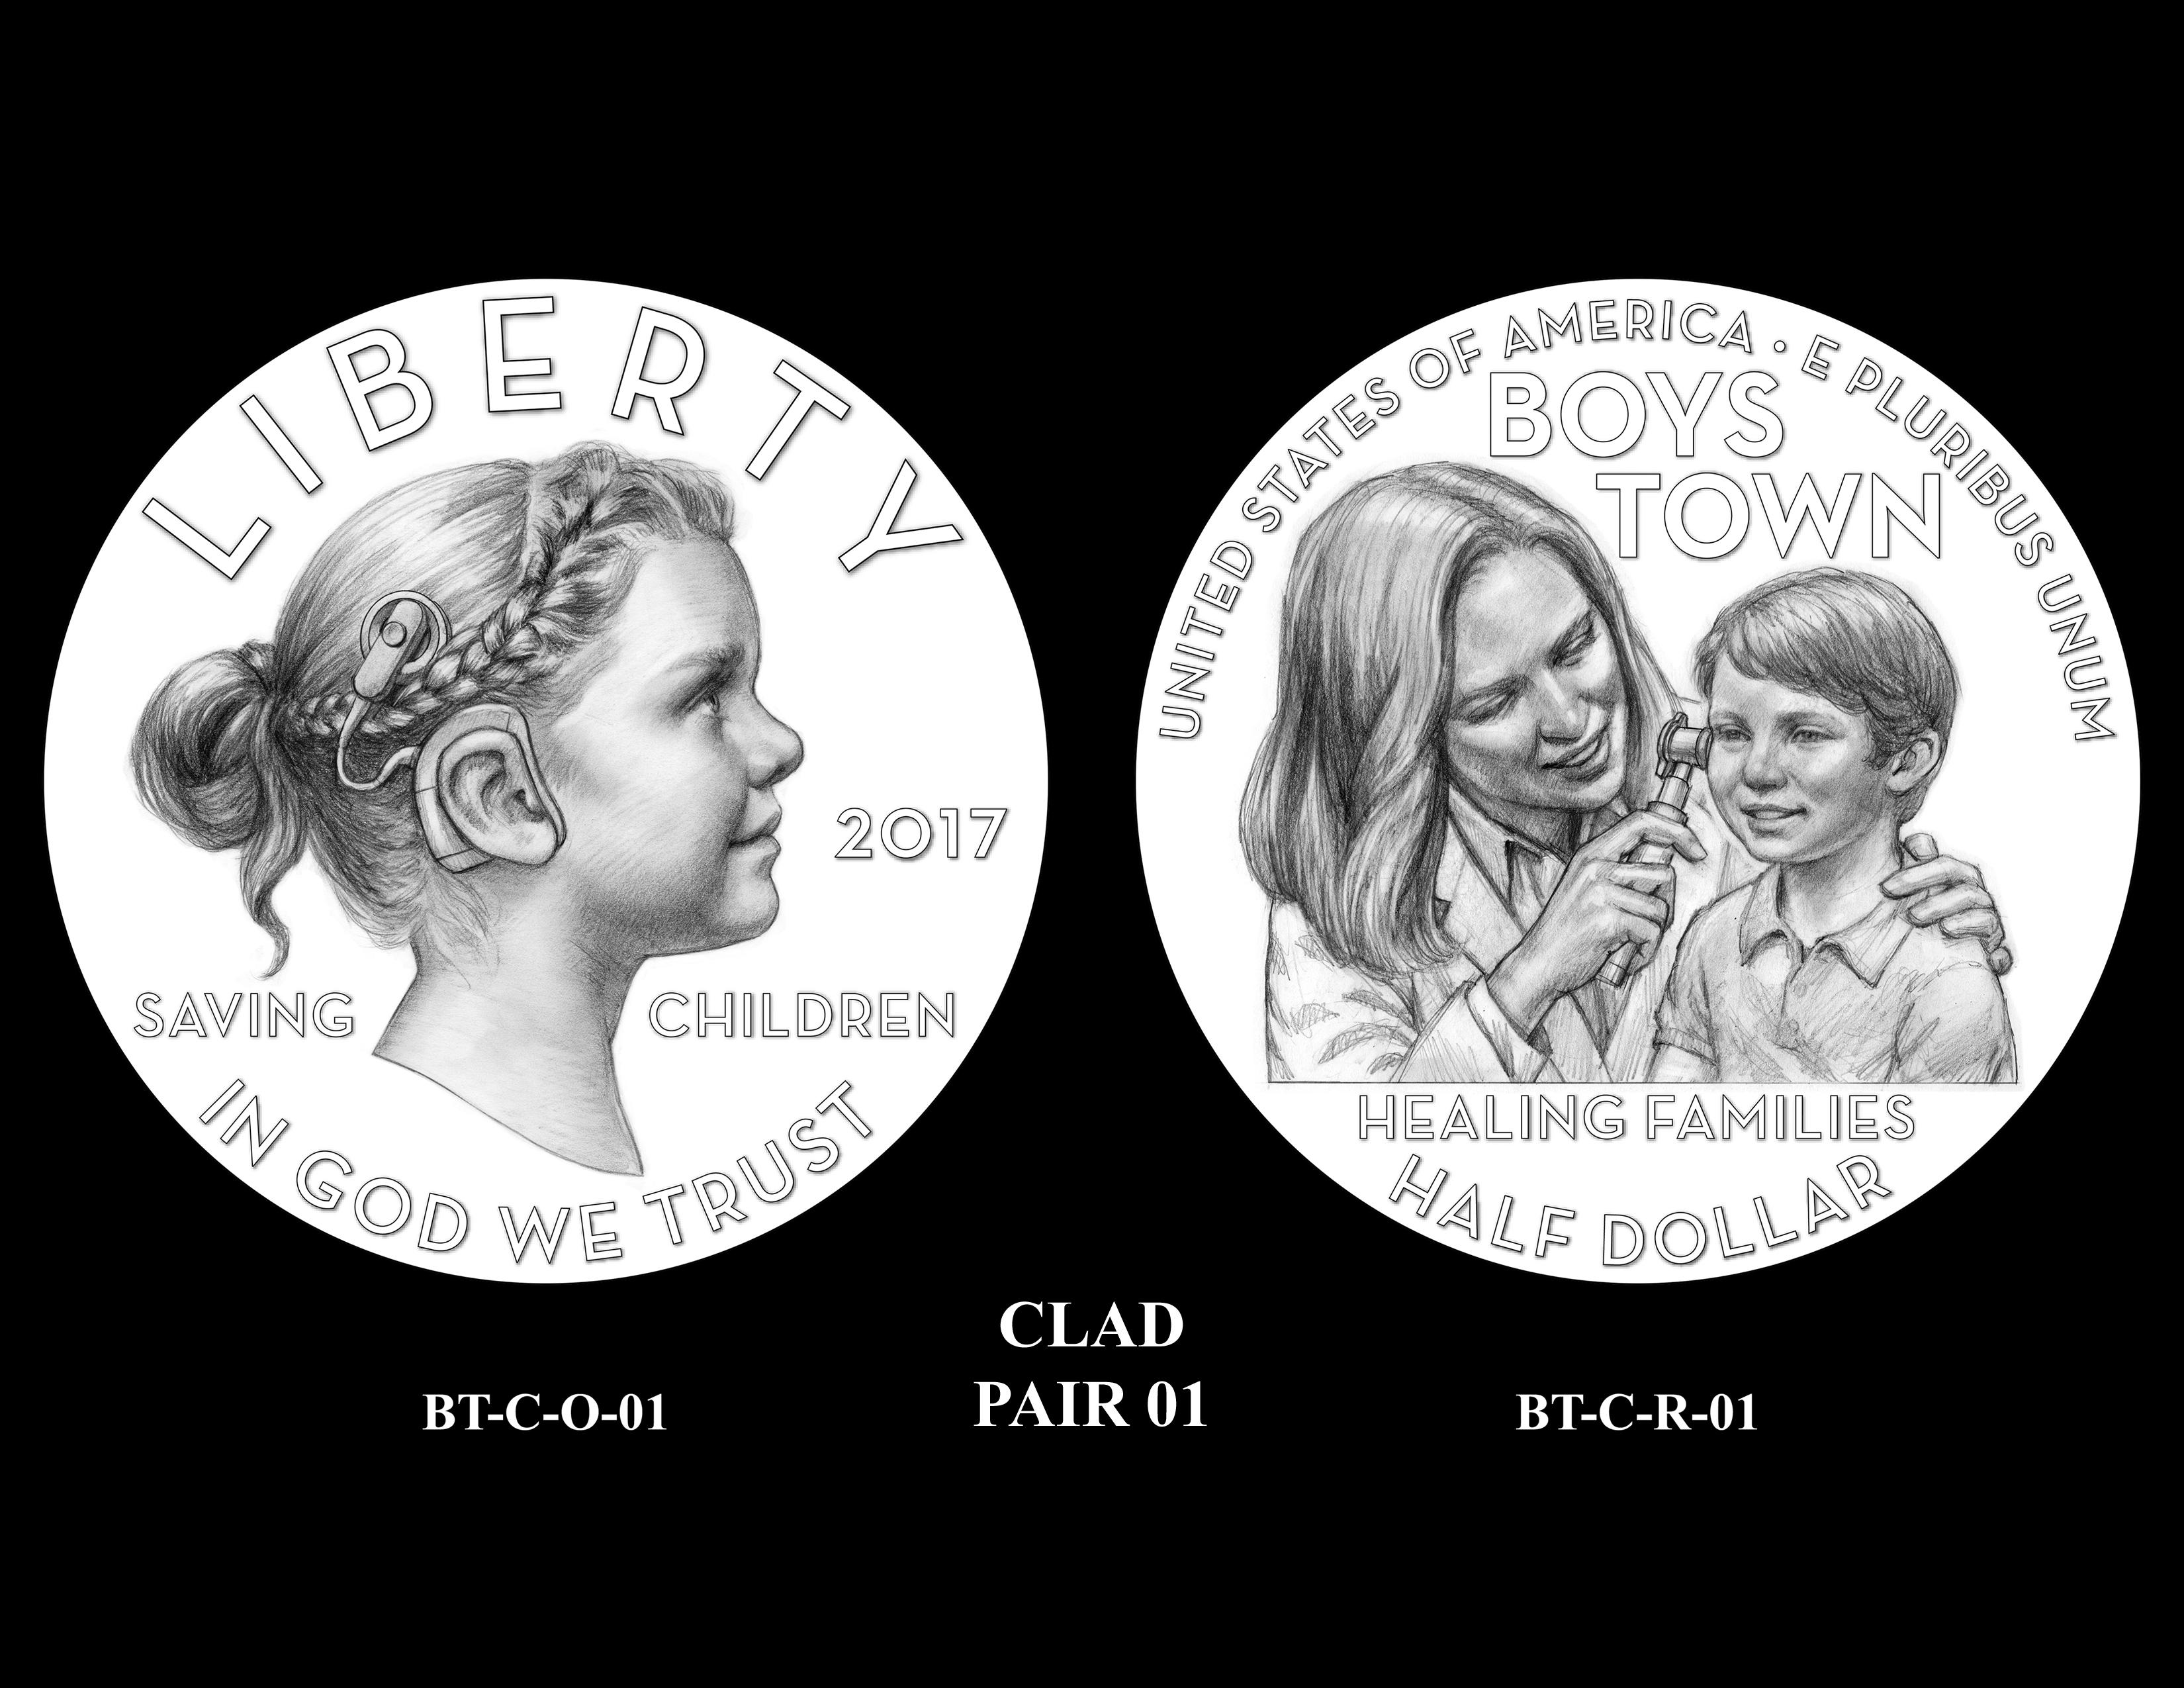 Clad-Pair-01 -- 2017 Boystown Centennial Commemorative Coin  Program